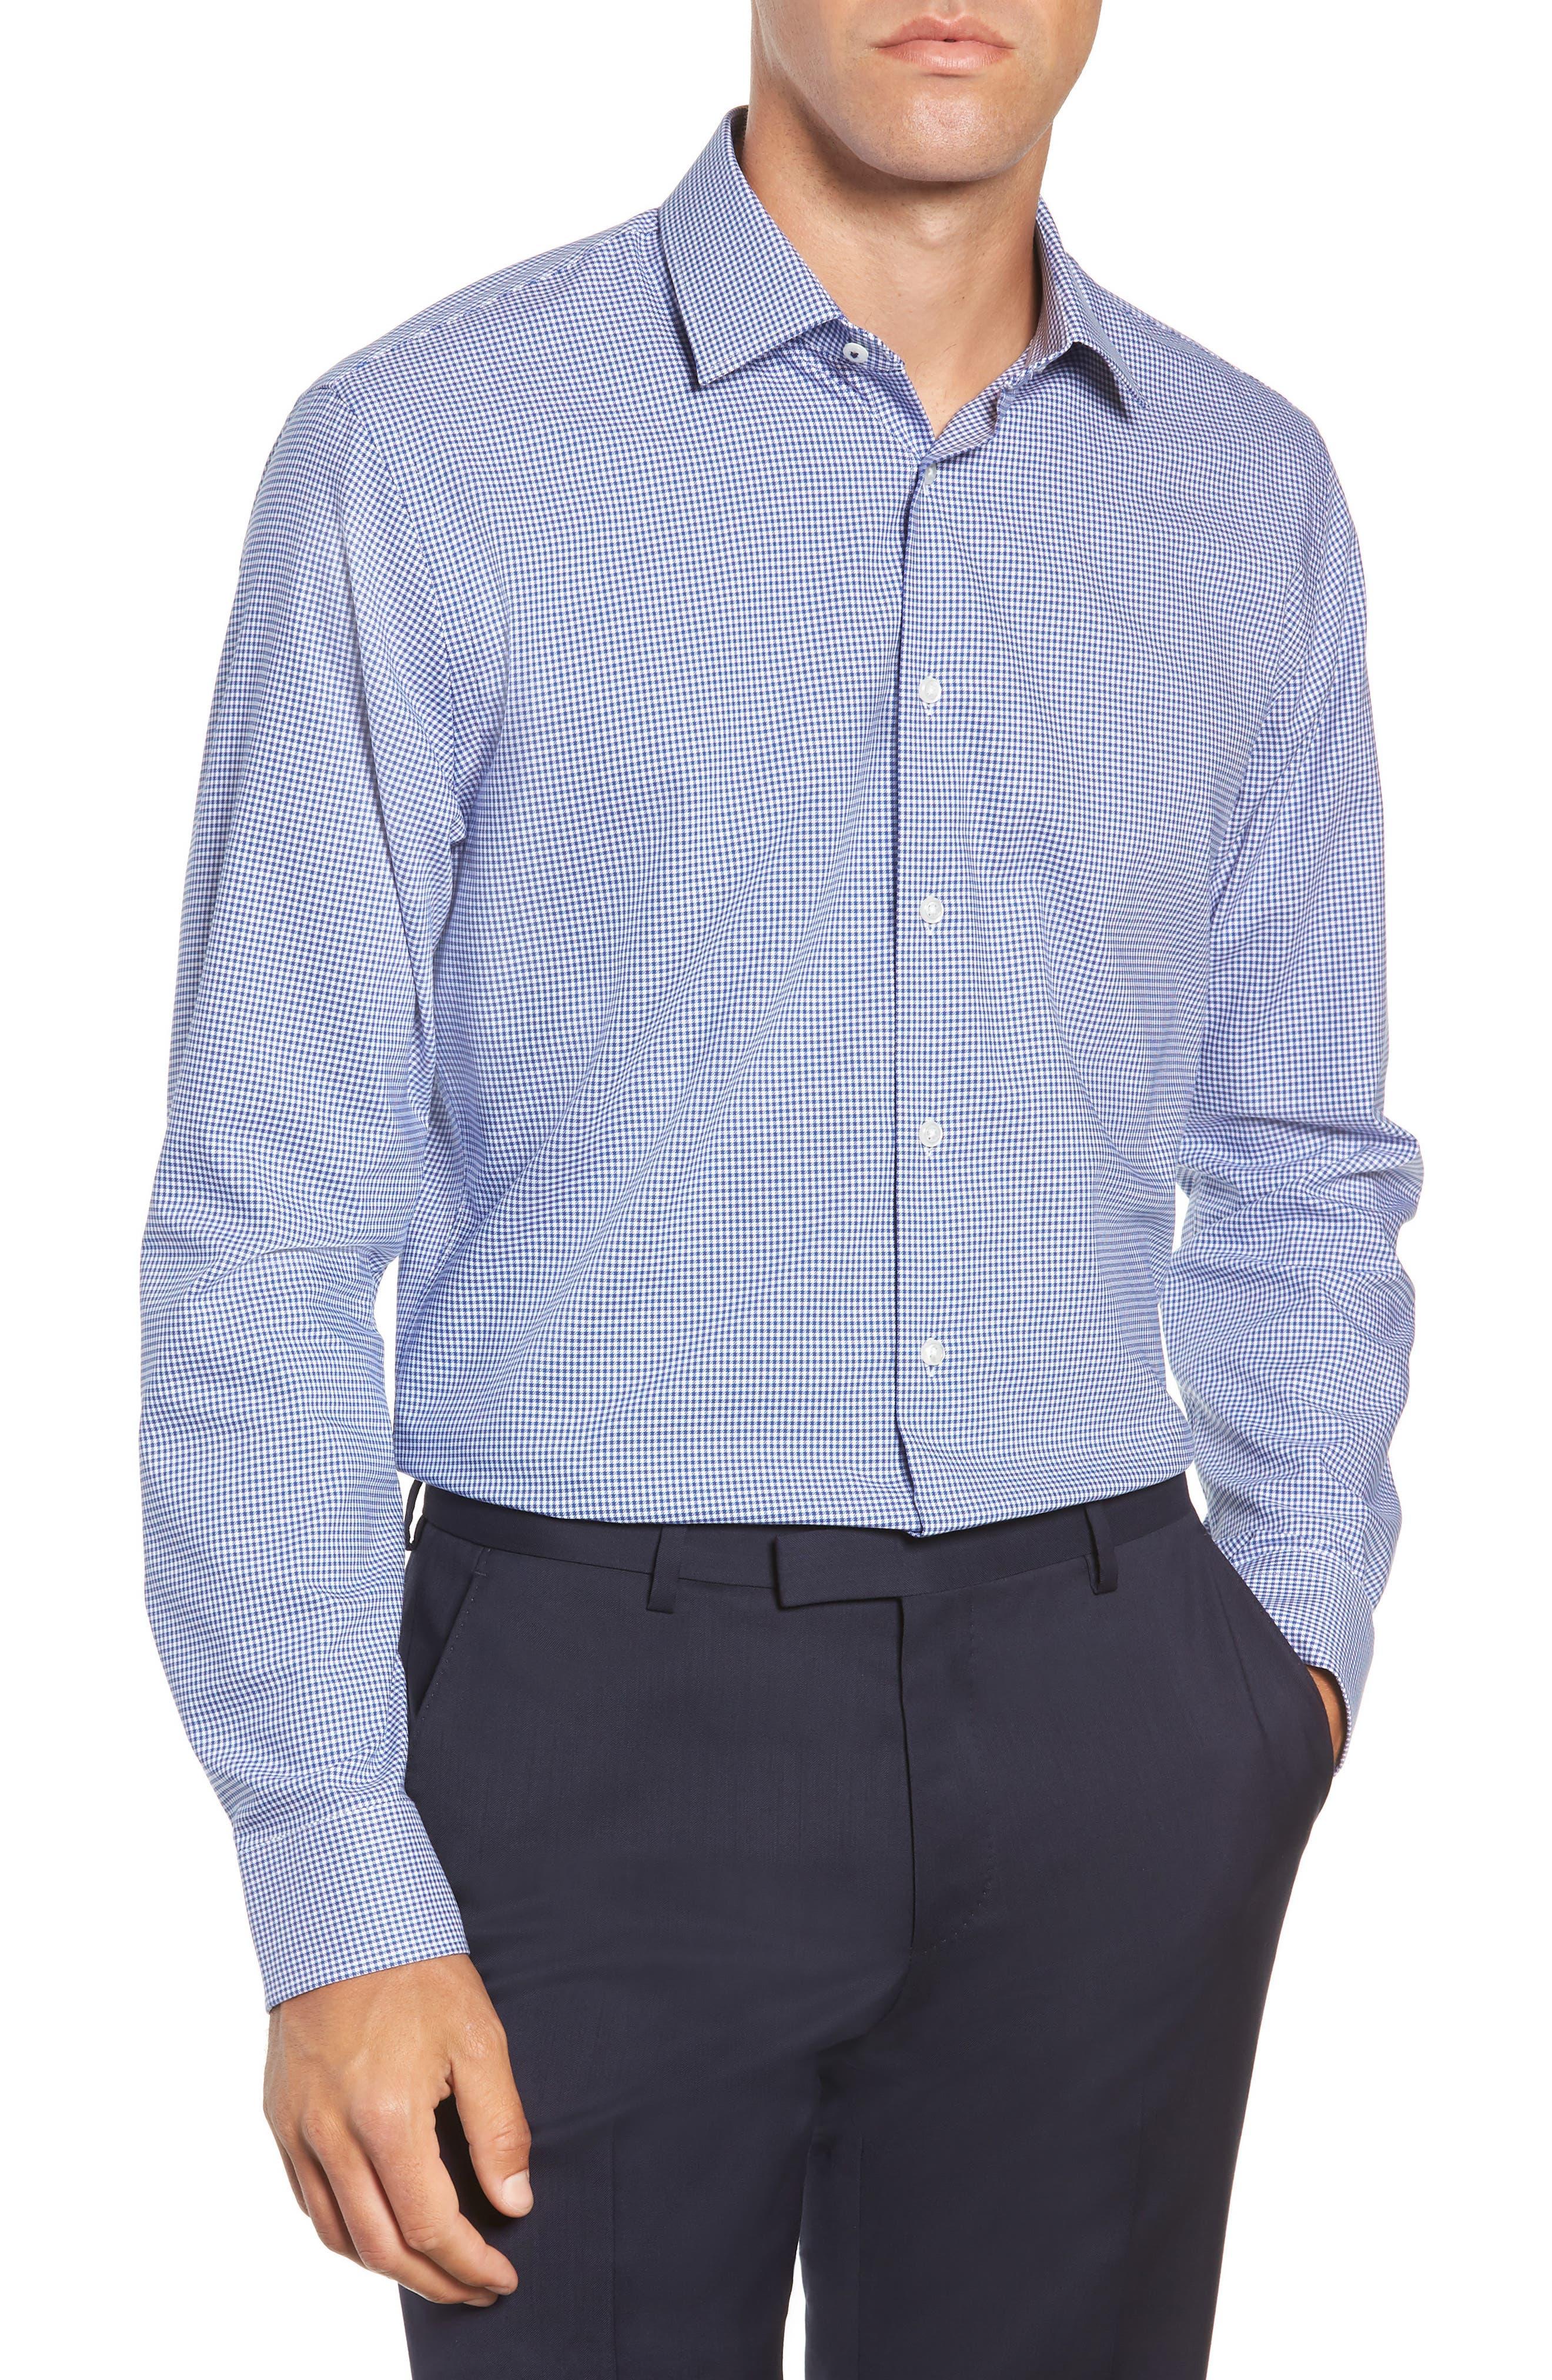 Tech-Smart Trim Fit Stretch Check Dress Shirt,                             Main thumbnail 1, color,                             BLUE MARINE